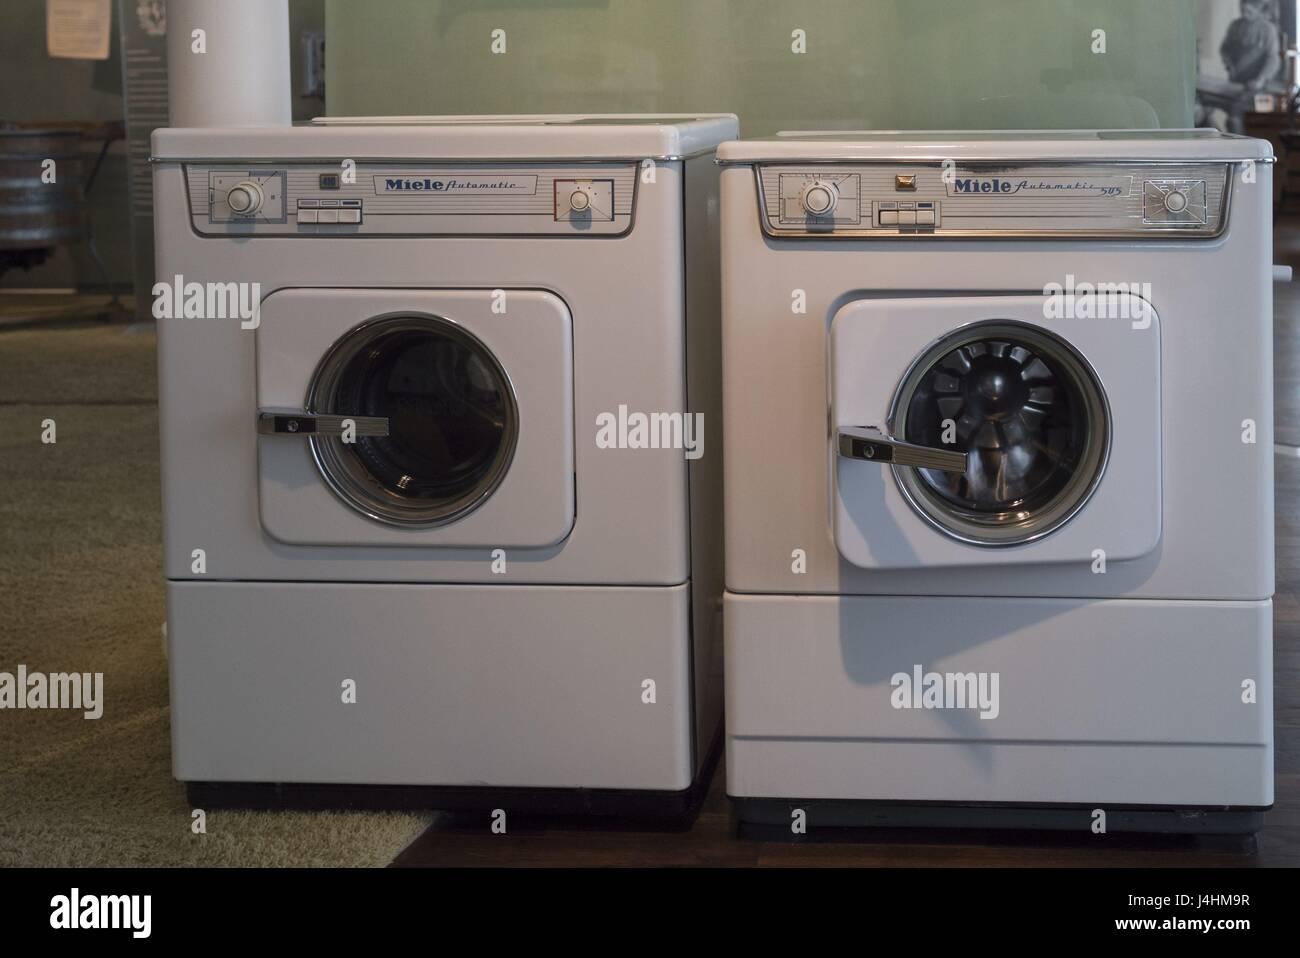 Miele waschmaschinen: miele waschmaschinen mit jahr garantie ab u ac